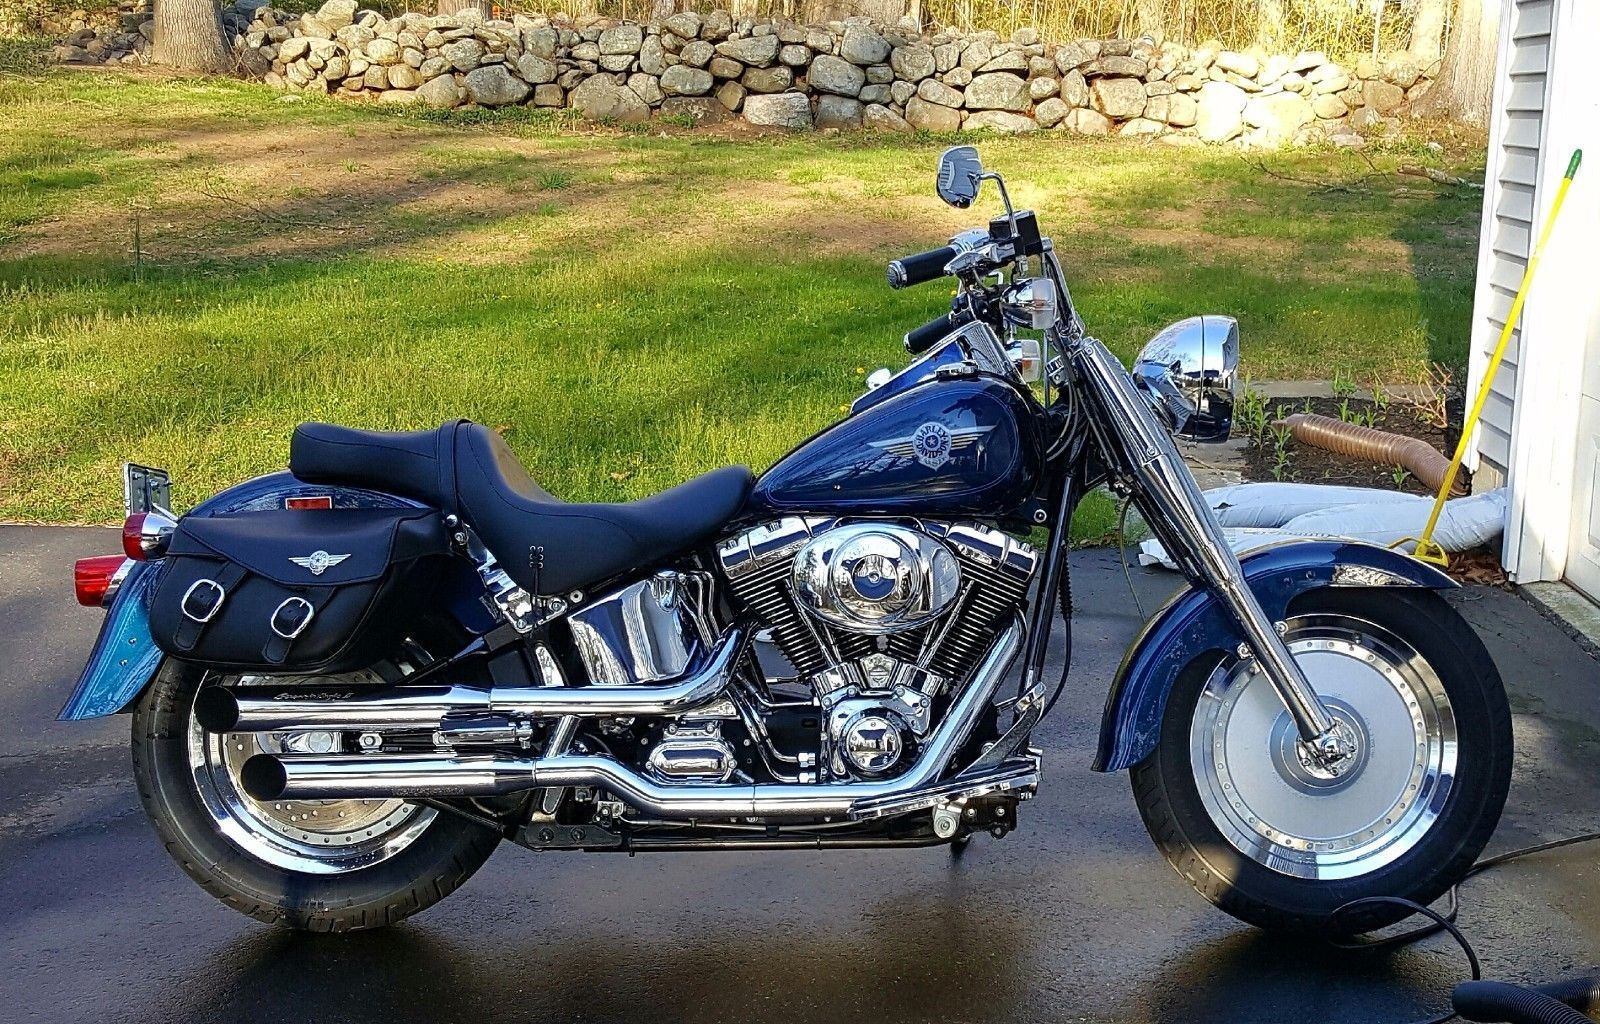 2000 Harley Davidson Softail Softail Harley Davidson Harley Bikes